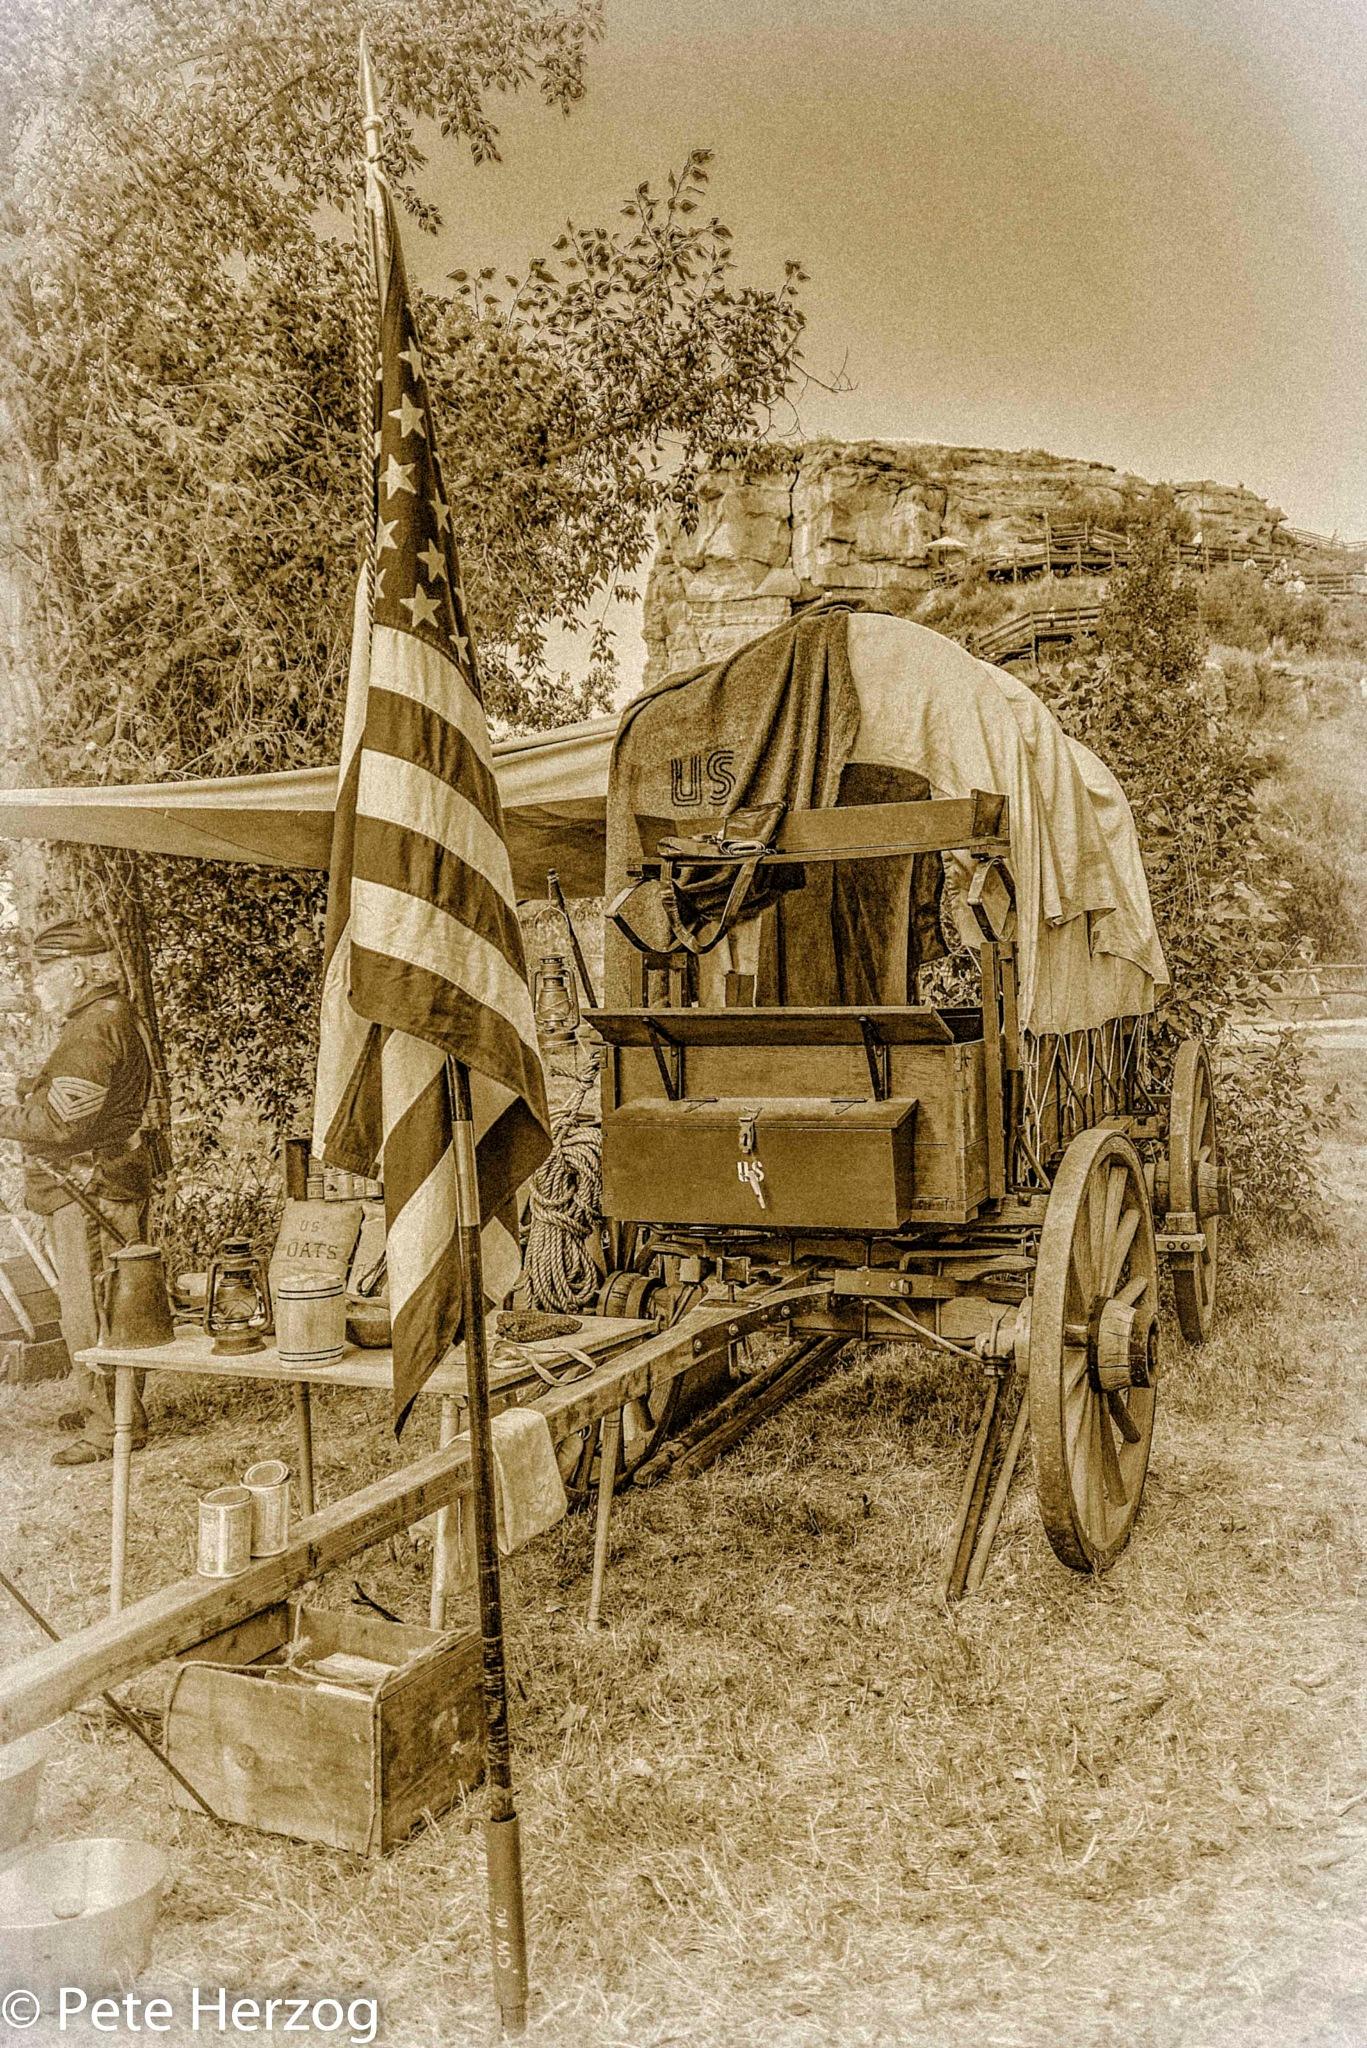 Cavalry Wagon by peter.herzog.3323